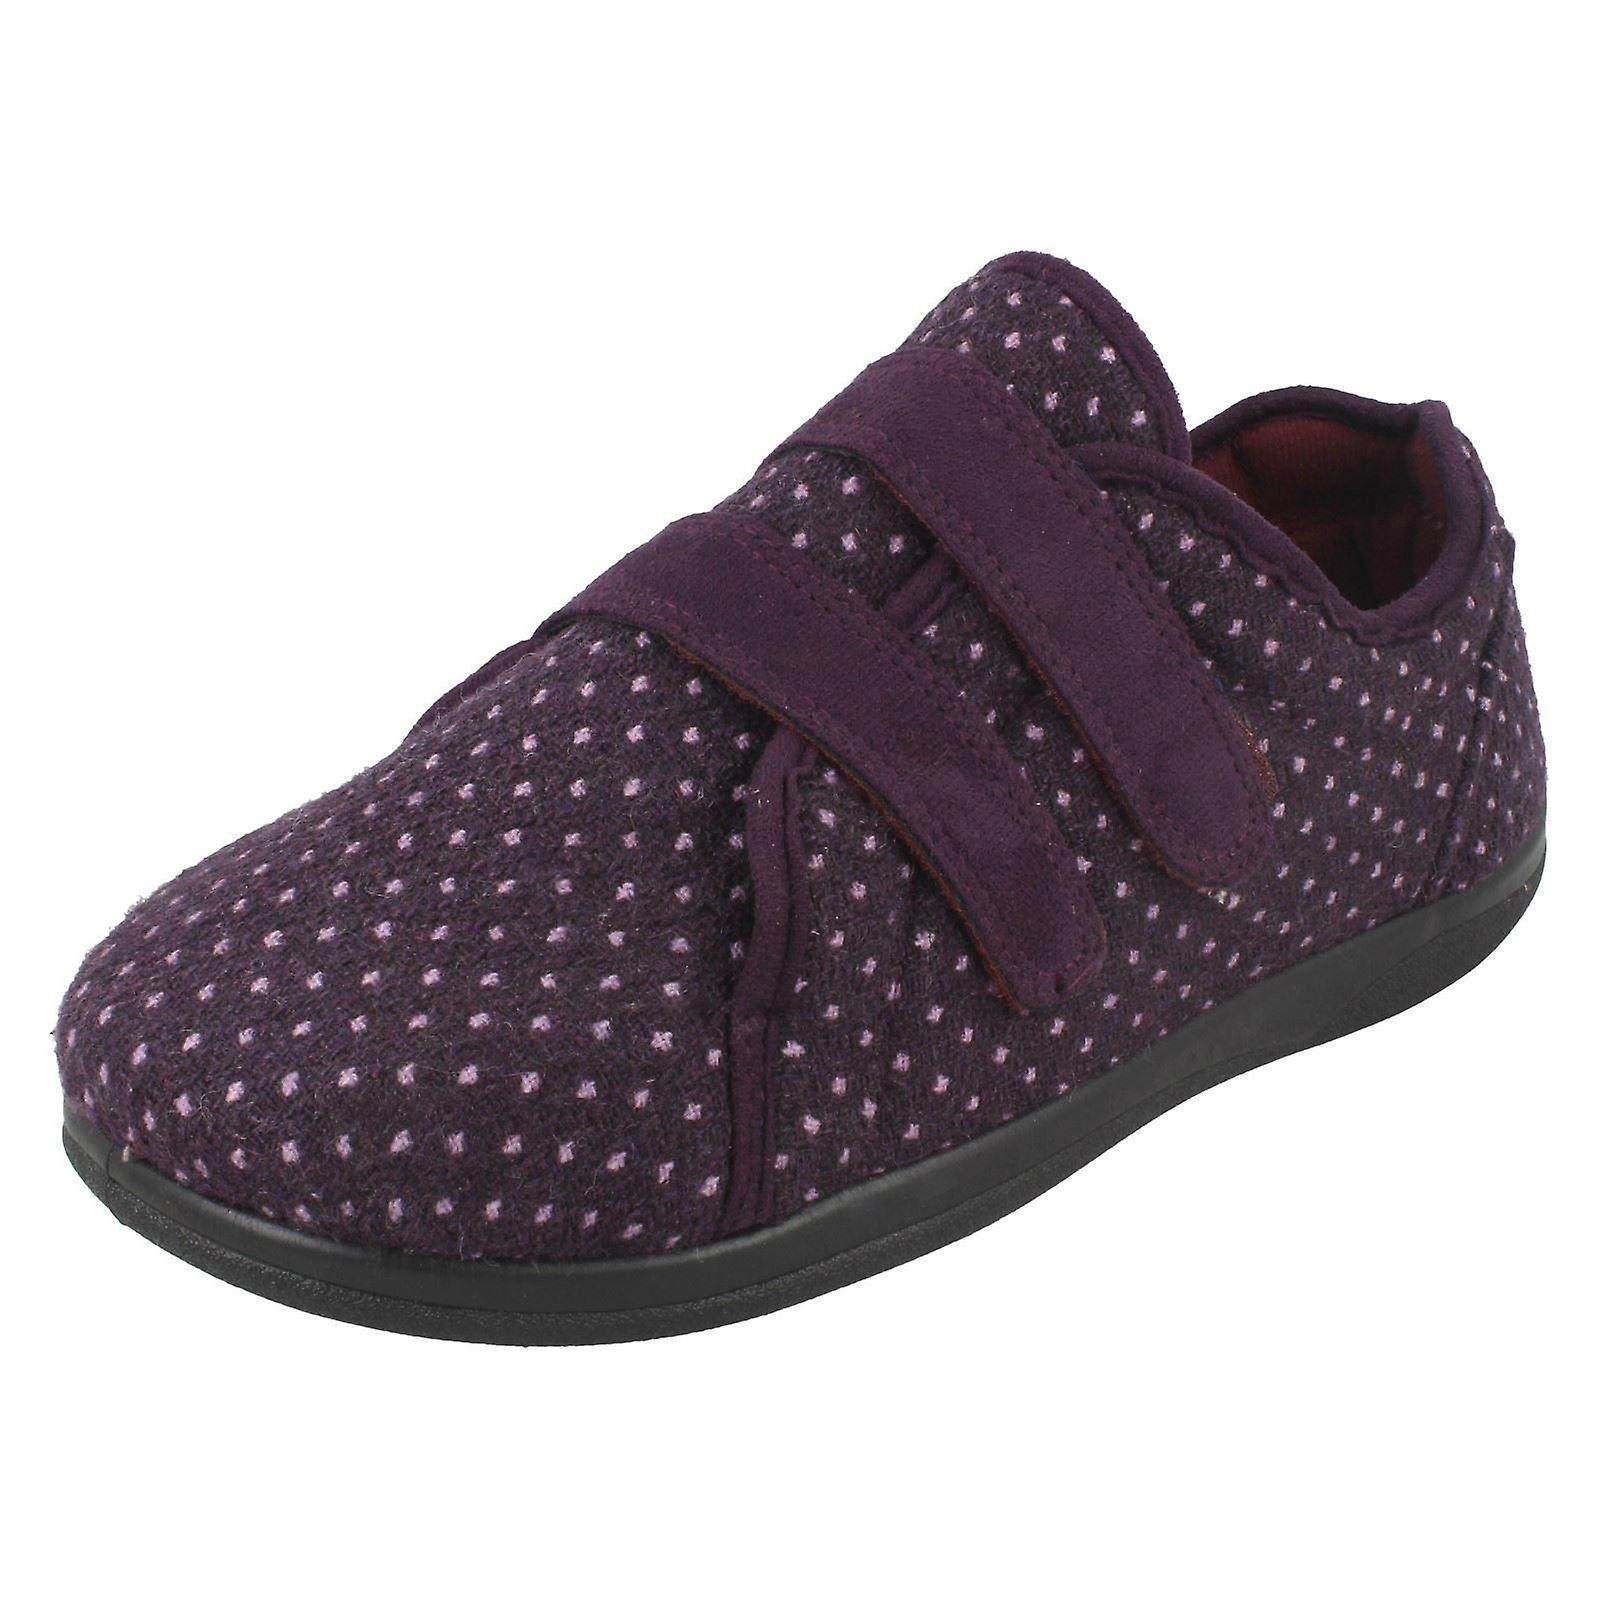 Ladies Padders Slipper Shoes Duo OdxL6